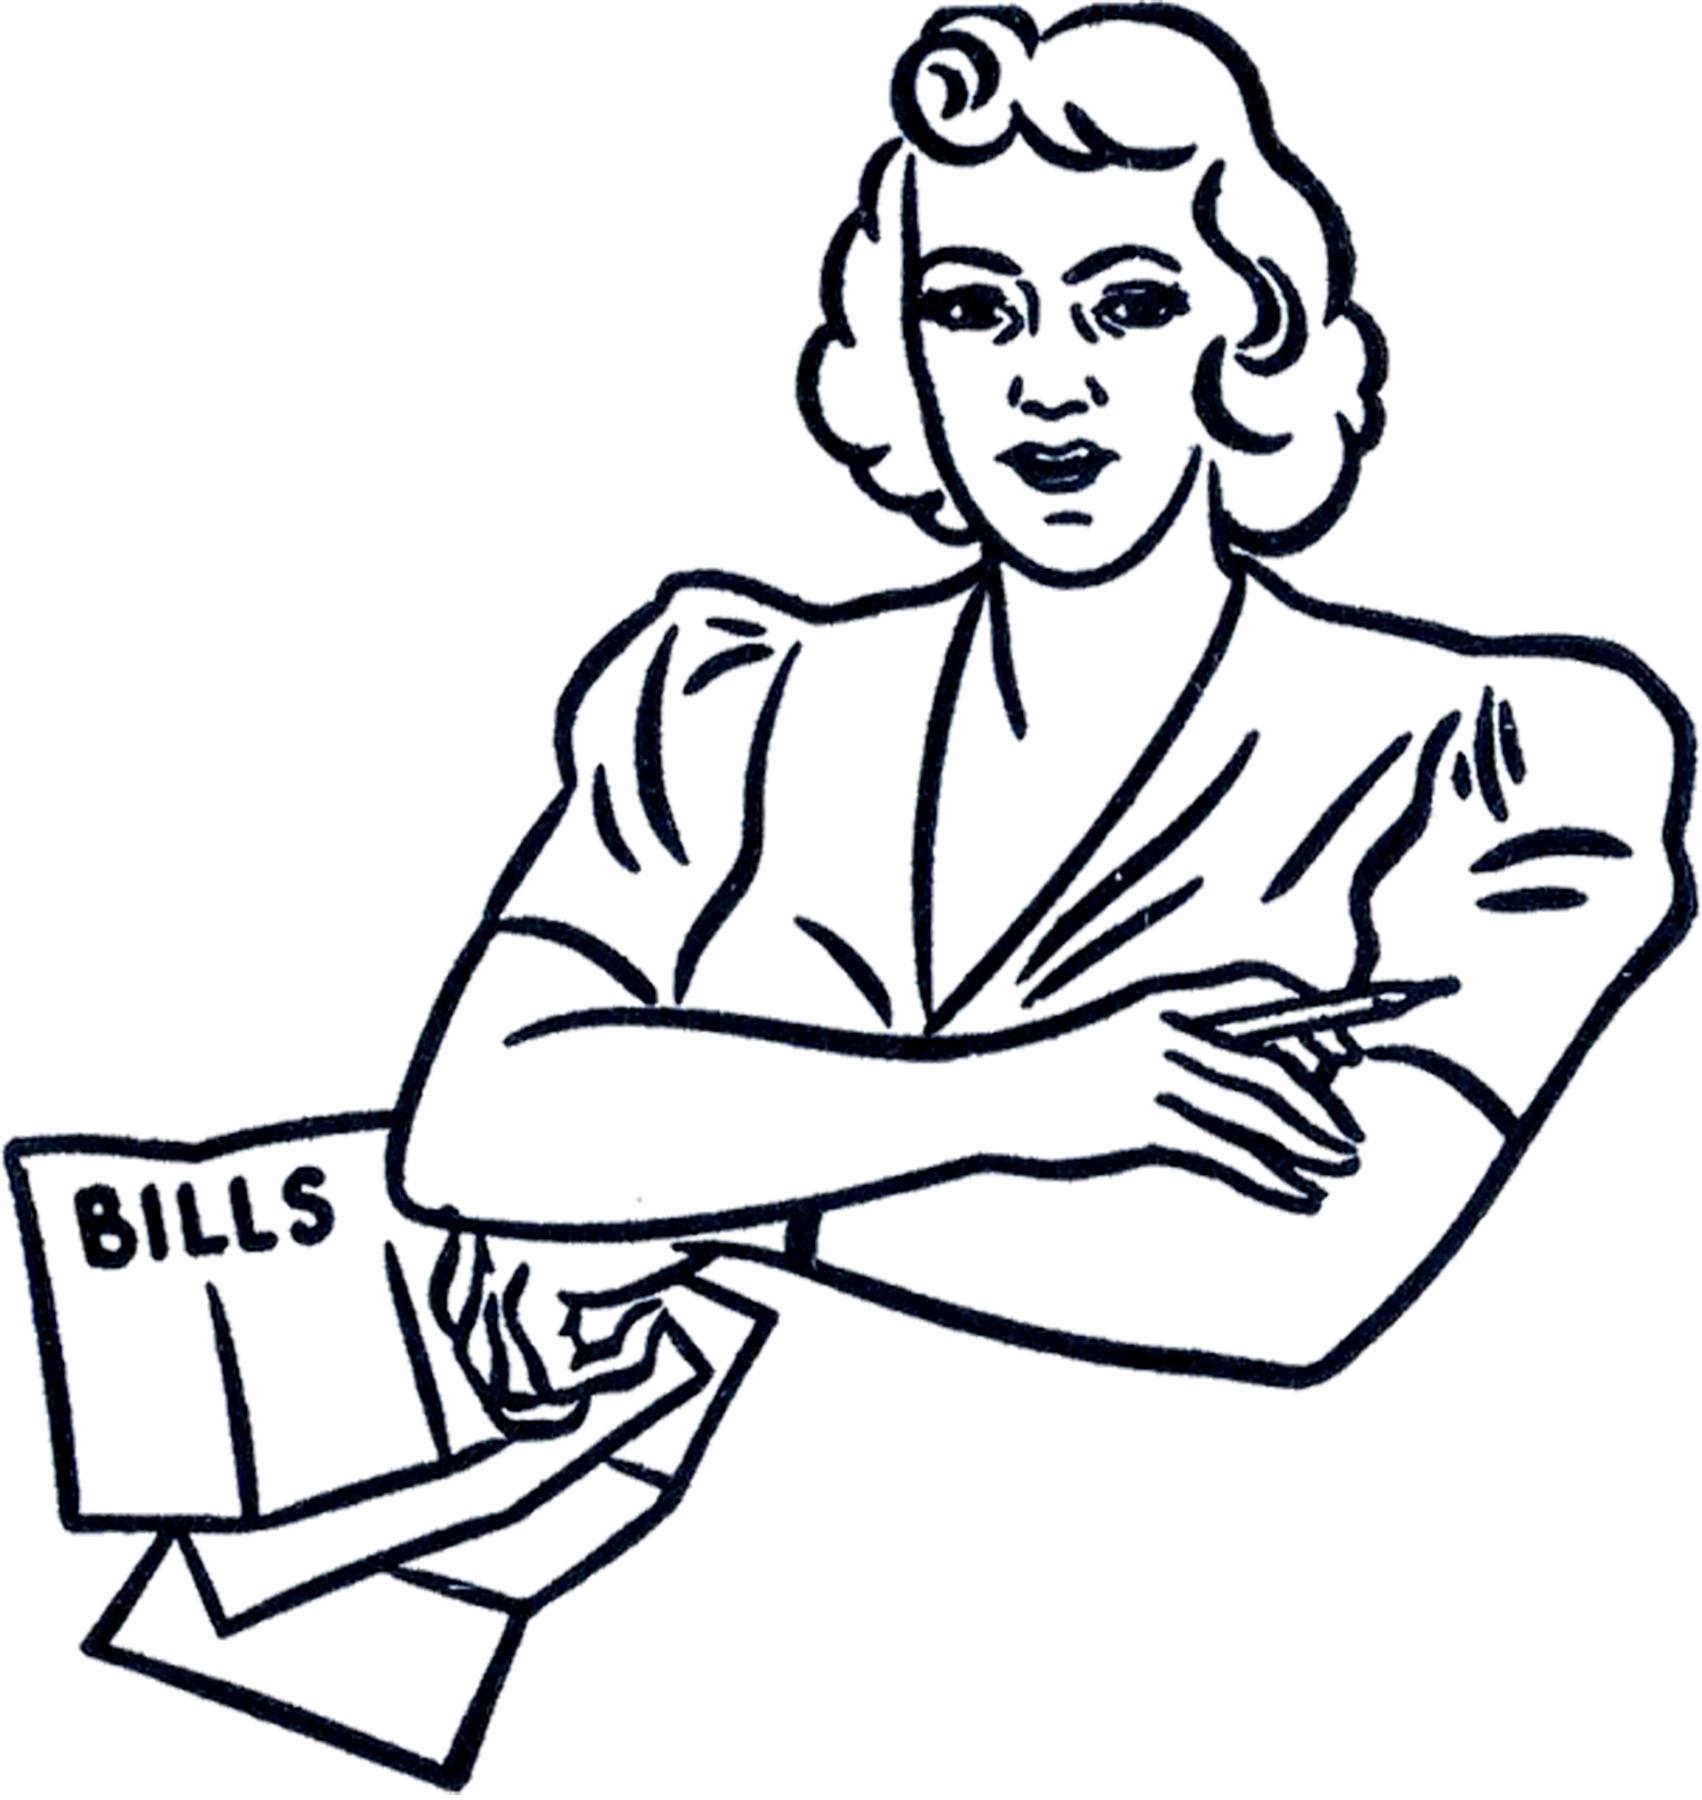 Retro Bills Lady Clip Art.